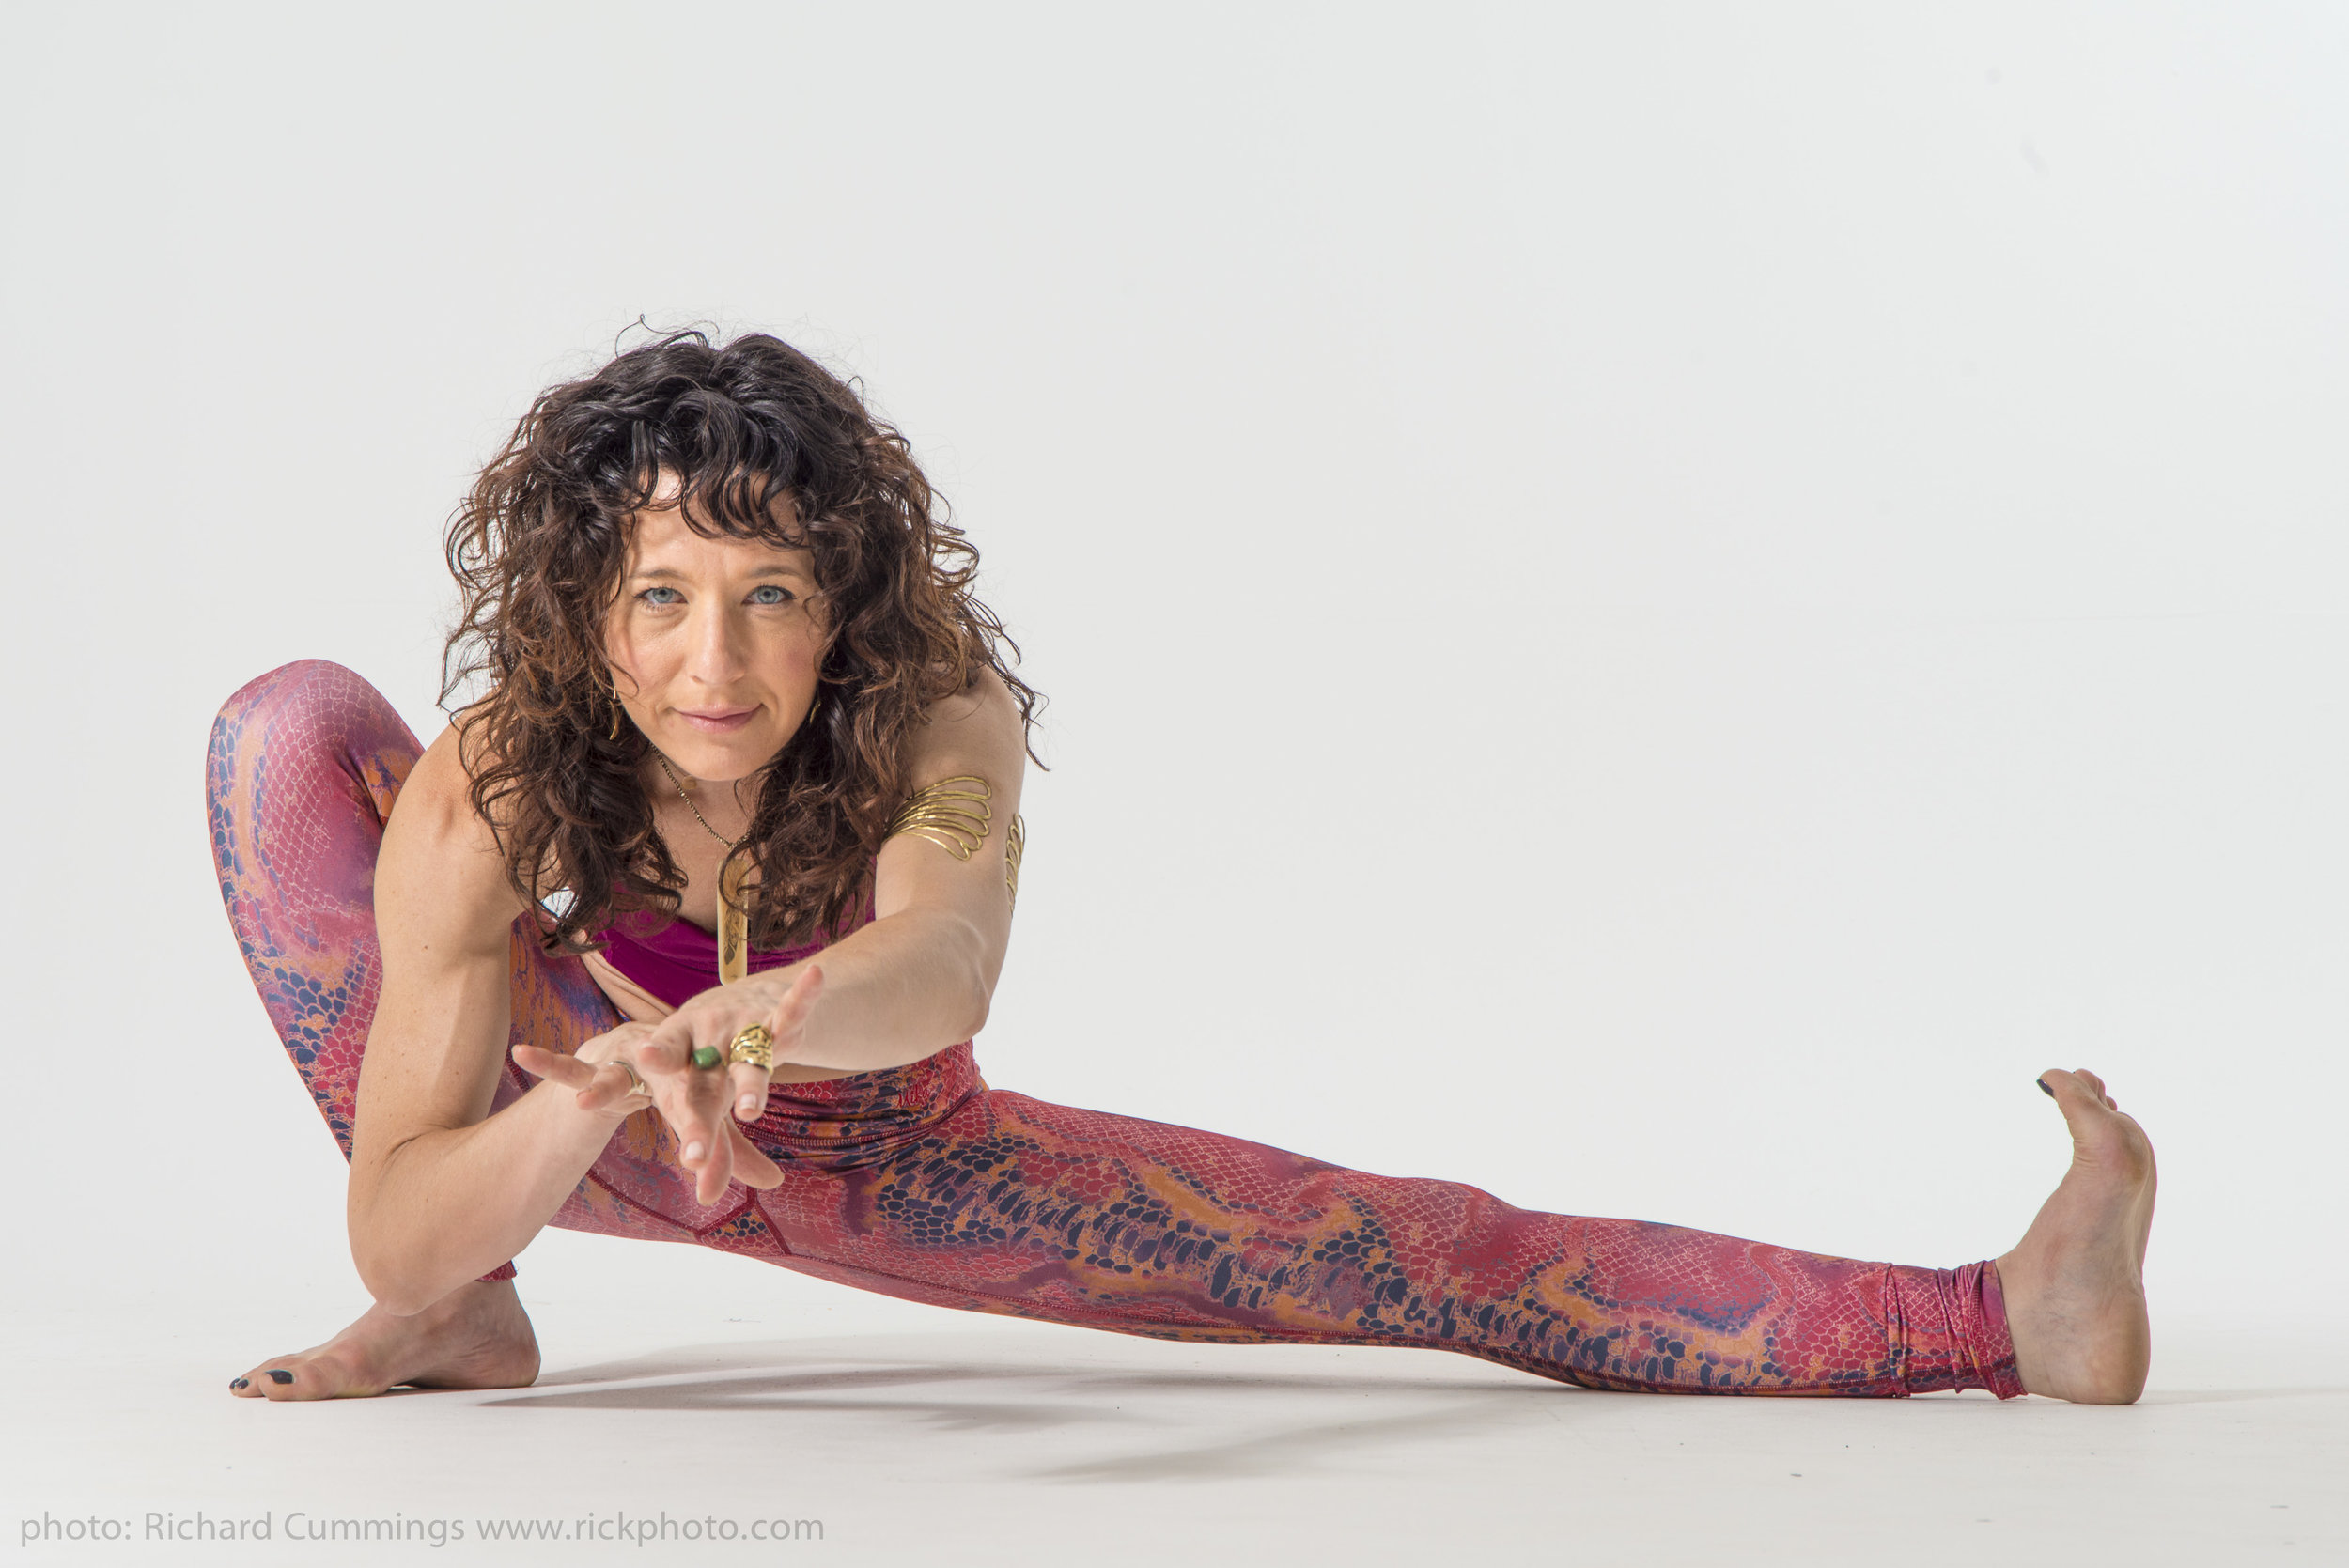 Shannon Paige Earth Yoga Boulder Bio